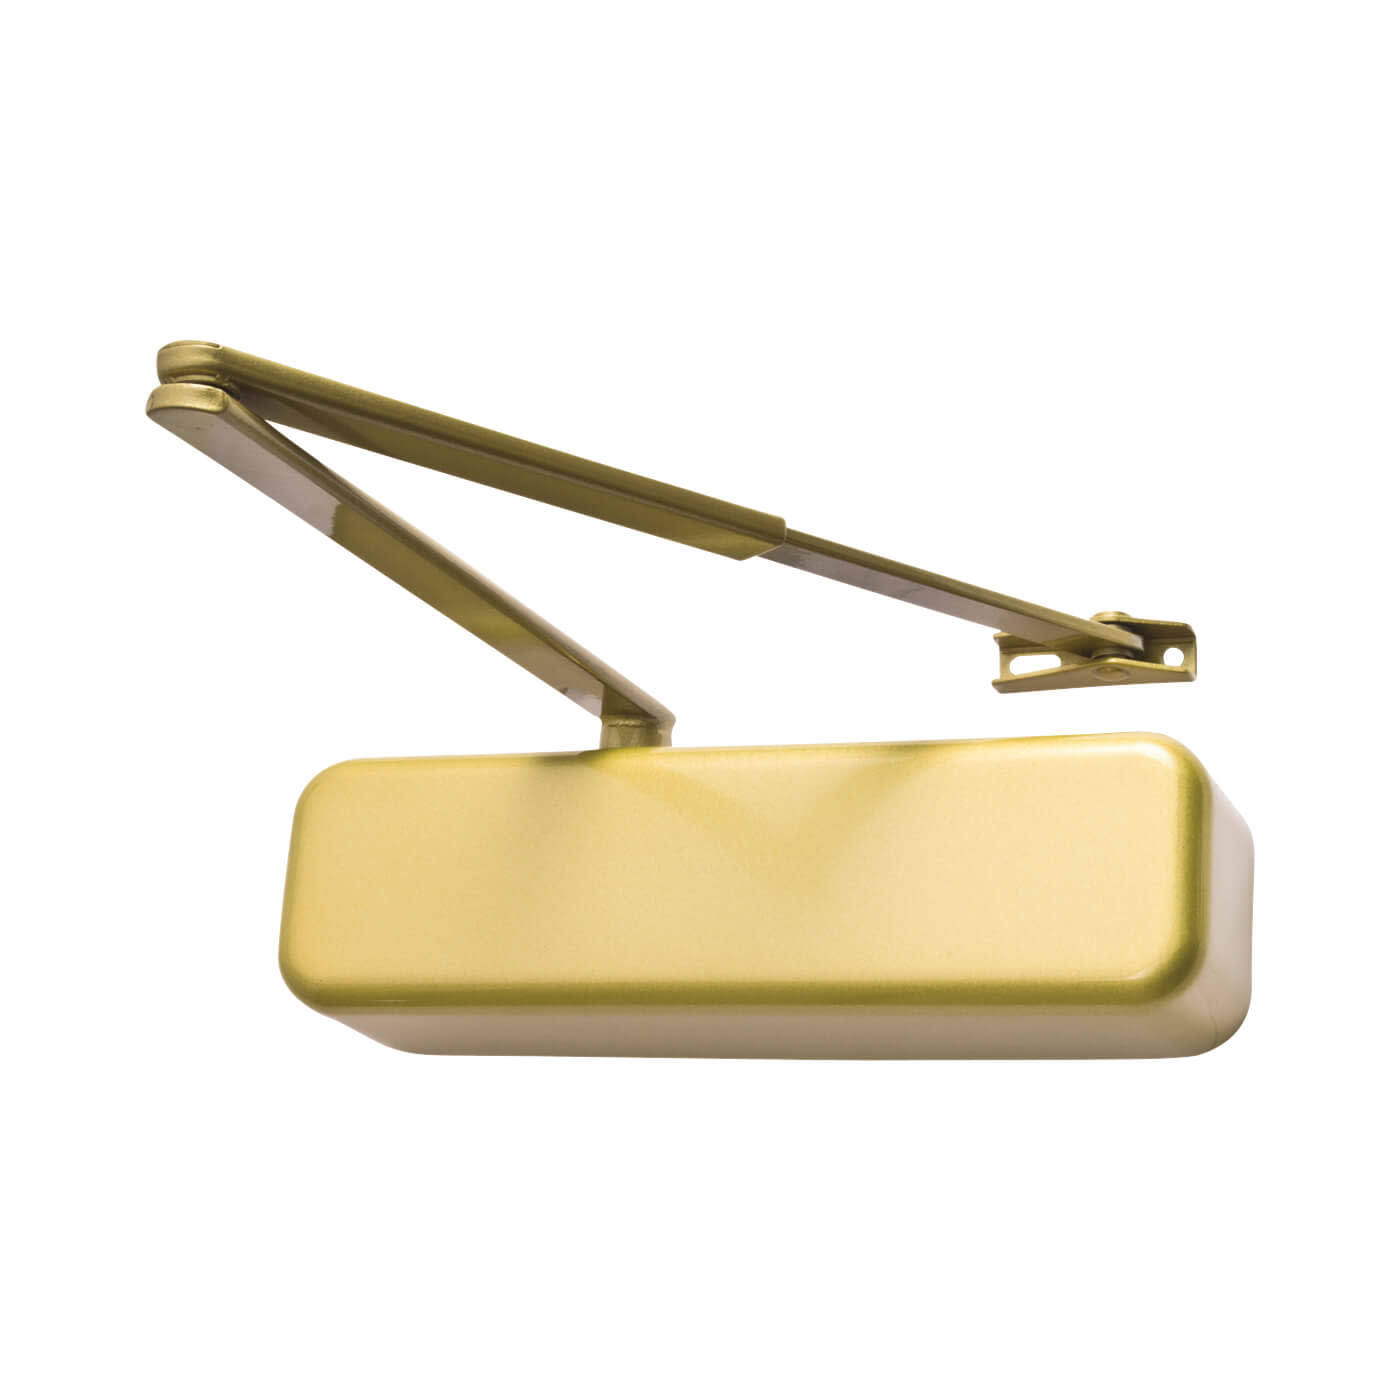 Arrone® AR3500 Door Closer - Gold Arm/Cover)